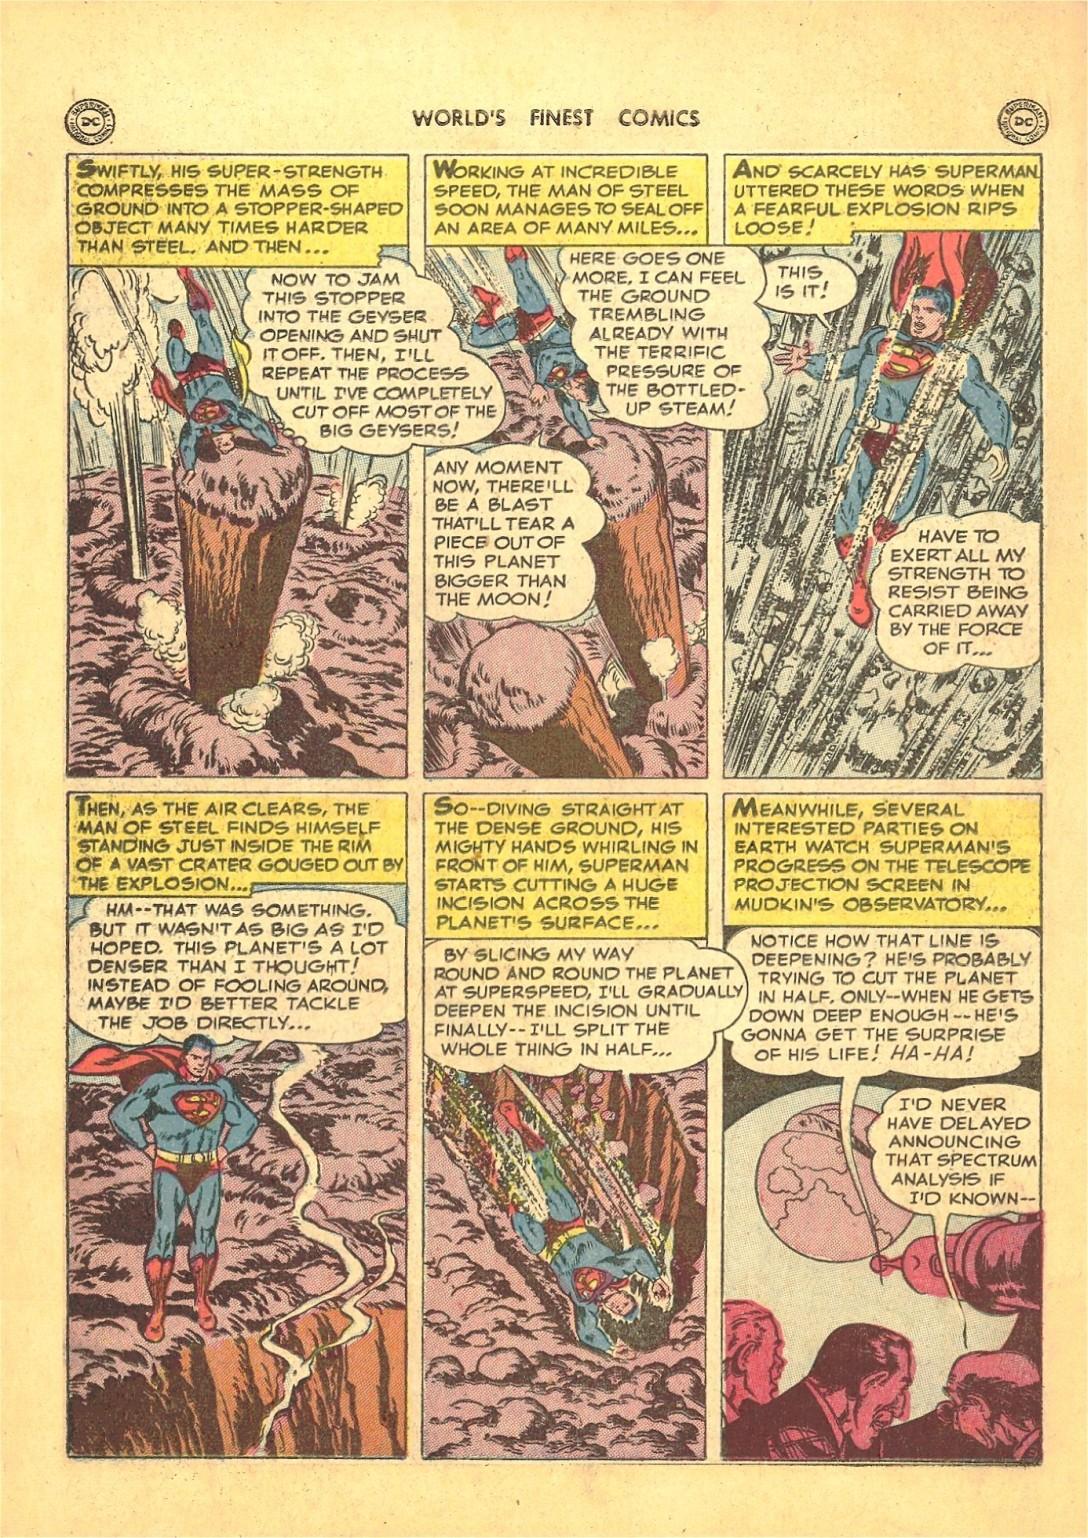 Read online World's Finest Comics comic -  Issue #50 - 11